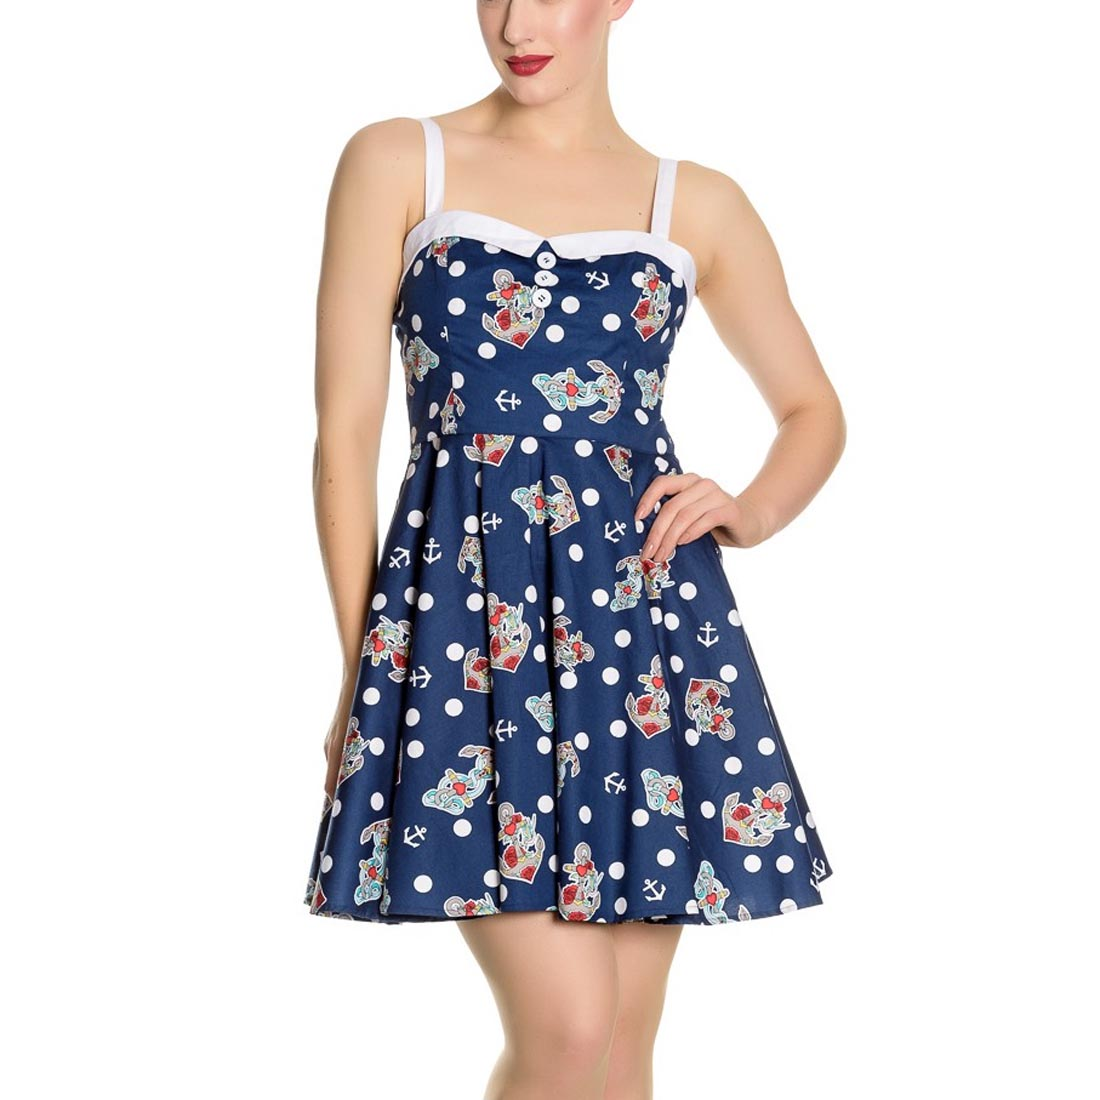 Hell-Bunny-Navy-Blue-50s-Nautical-Mini-Dress-OCEANA-Polka-Dot-All-Sizes thumbnail 3